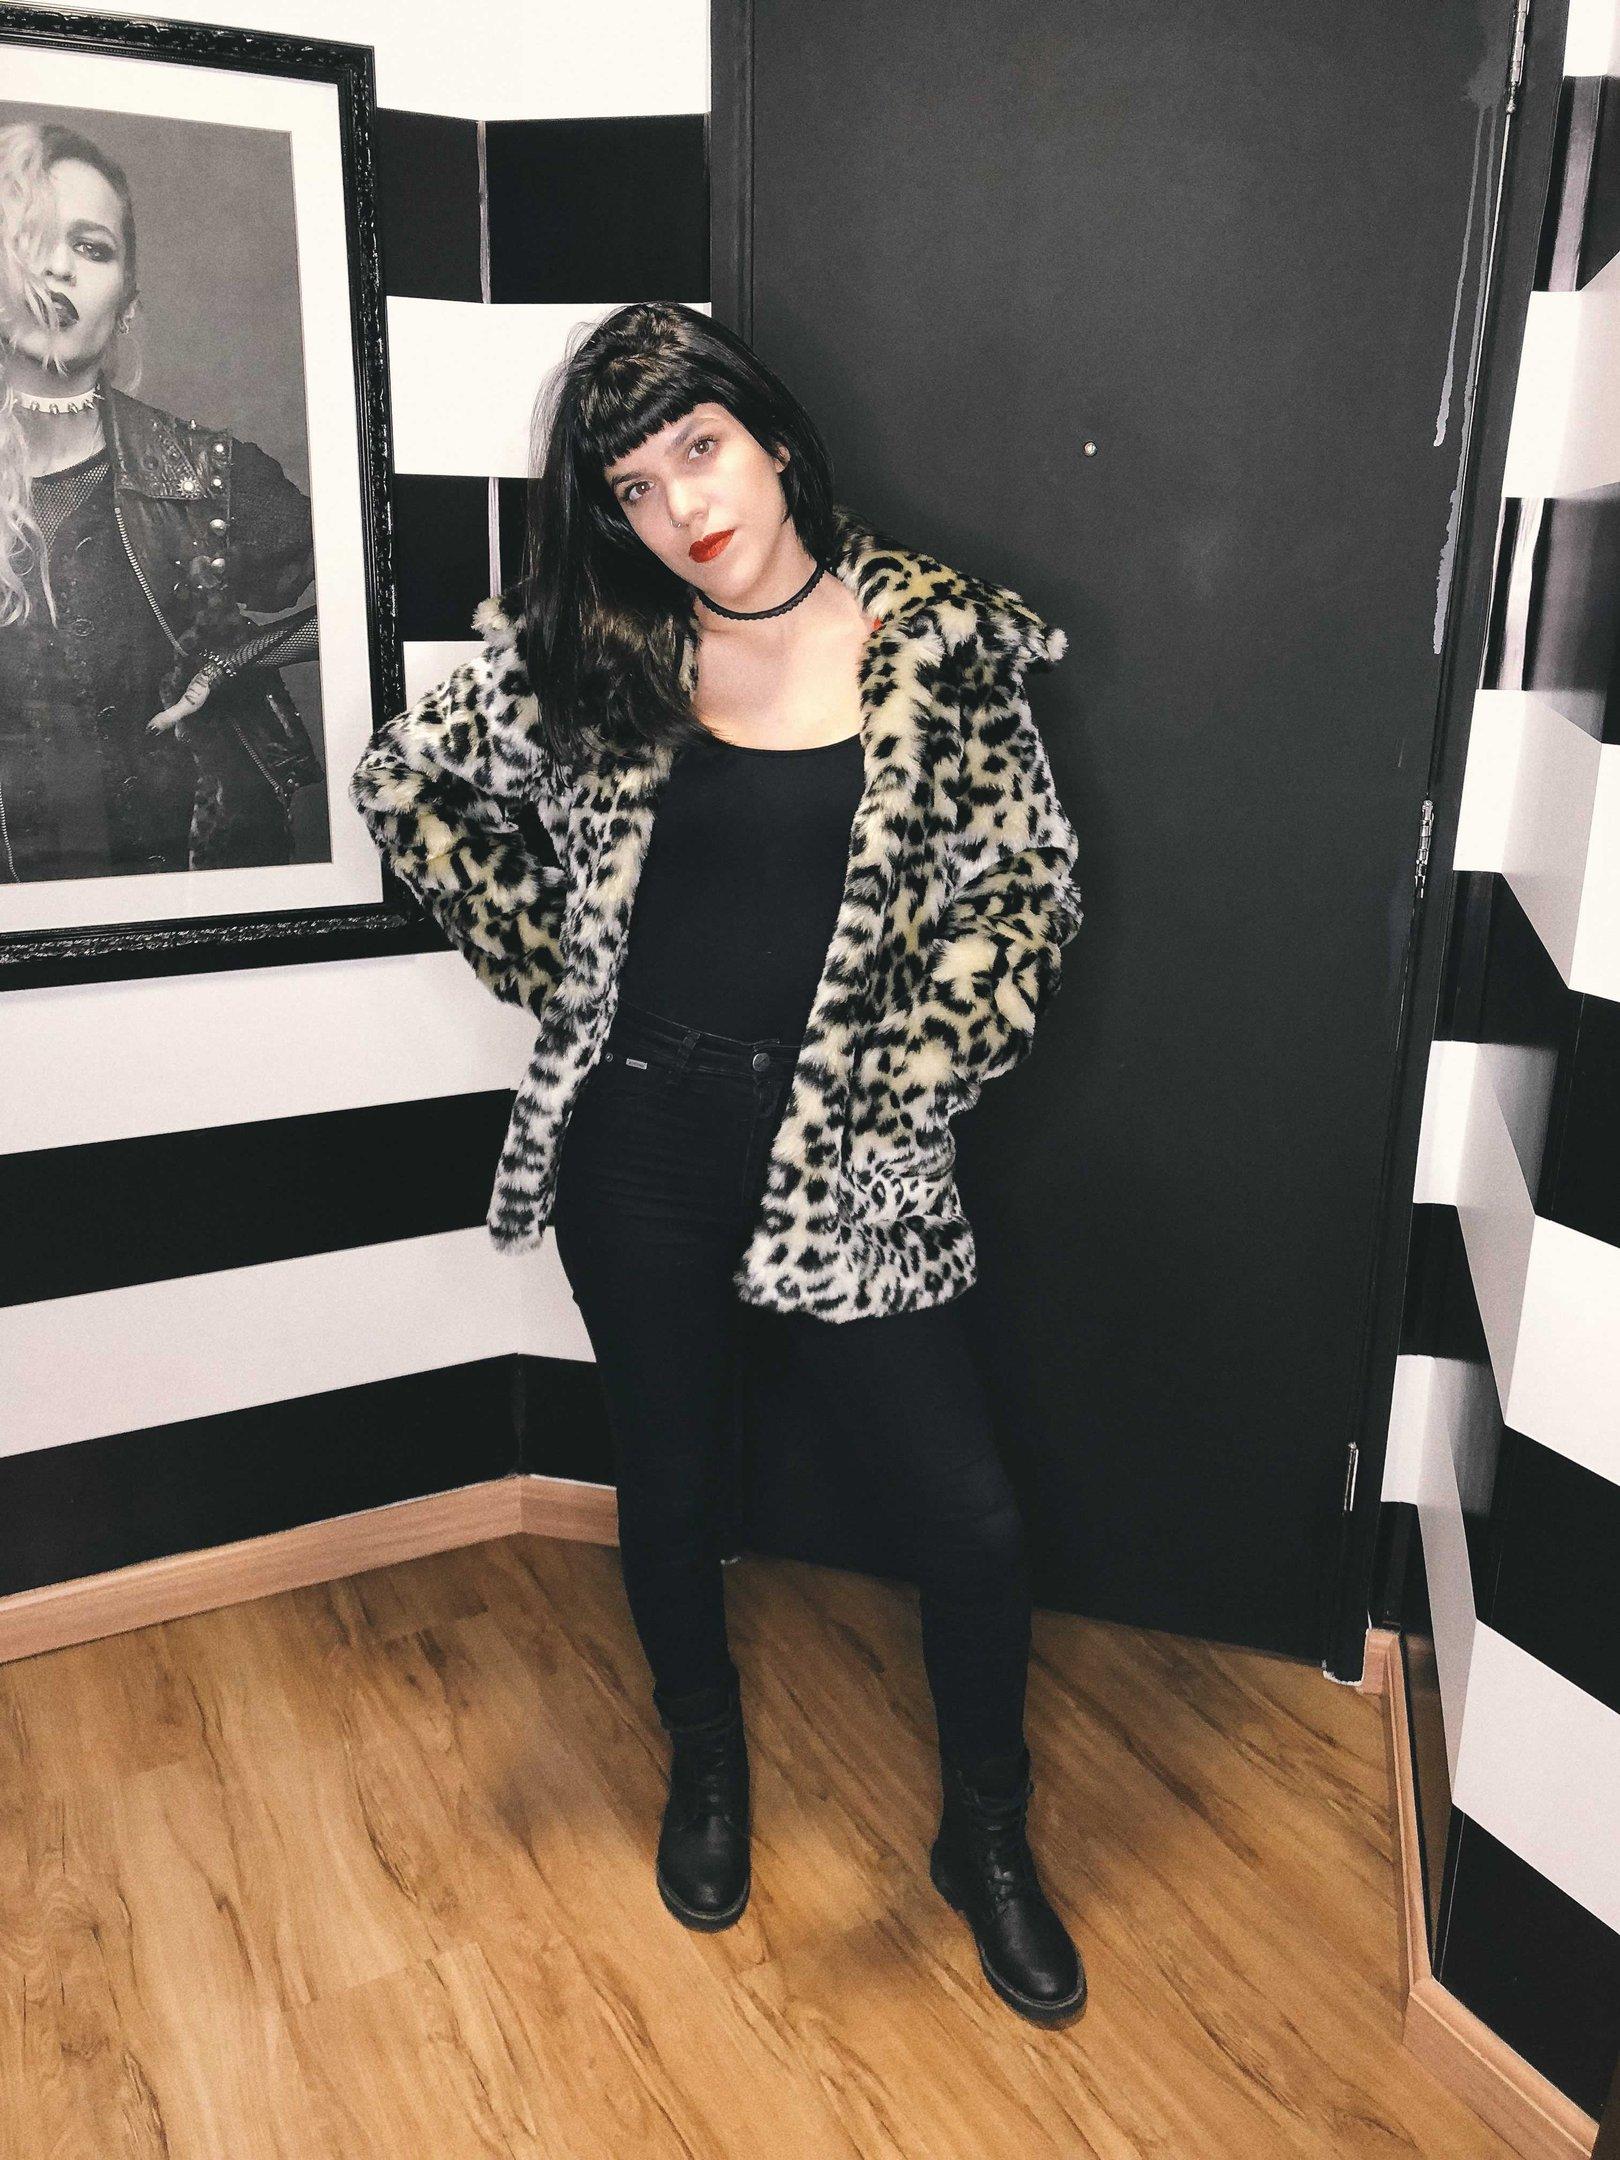 Julia Abud - calca-preta-camiseta-preta-casaco-oncinha-coturno - casaco oncinha - inverno - street style